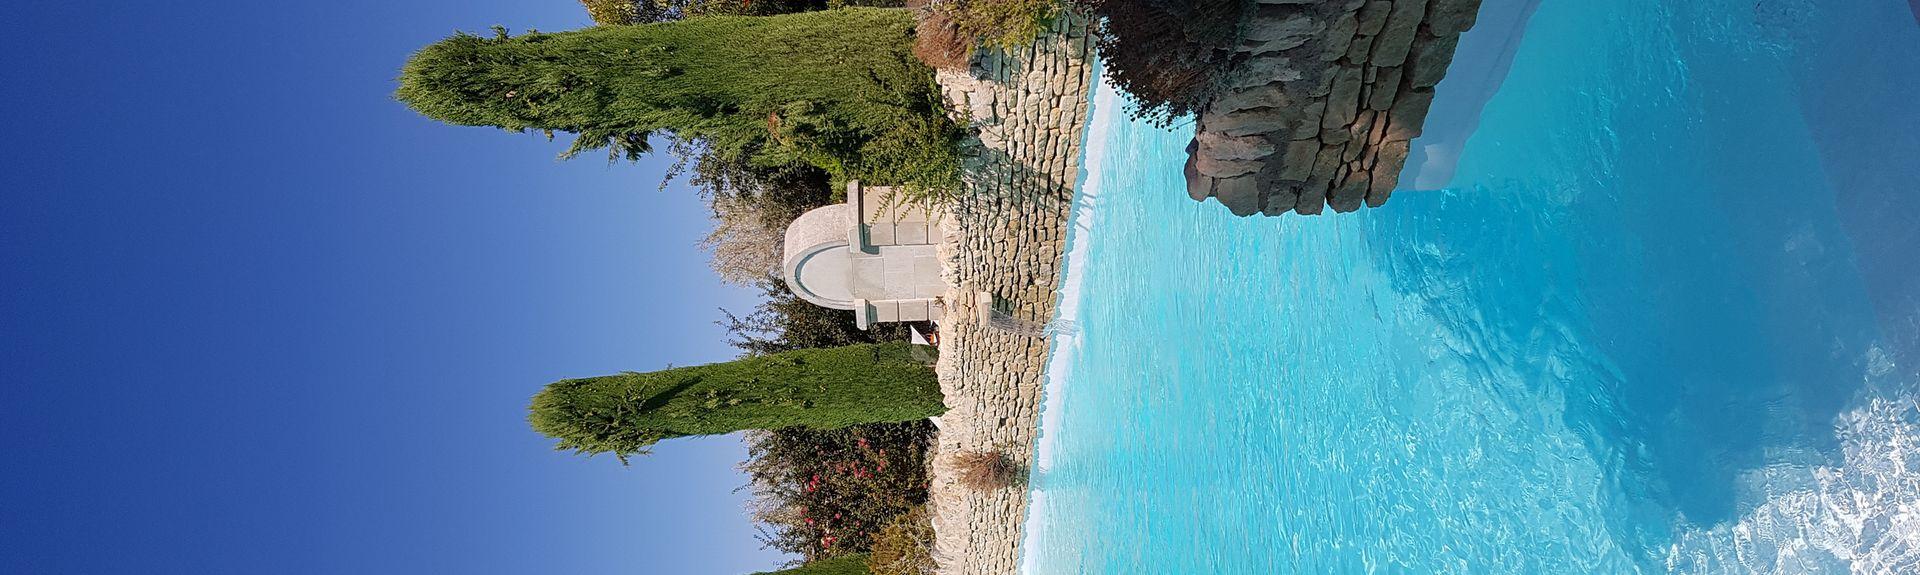 Venasque, France